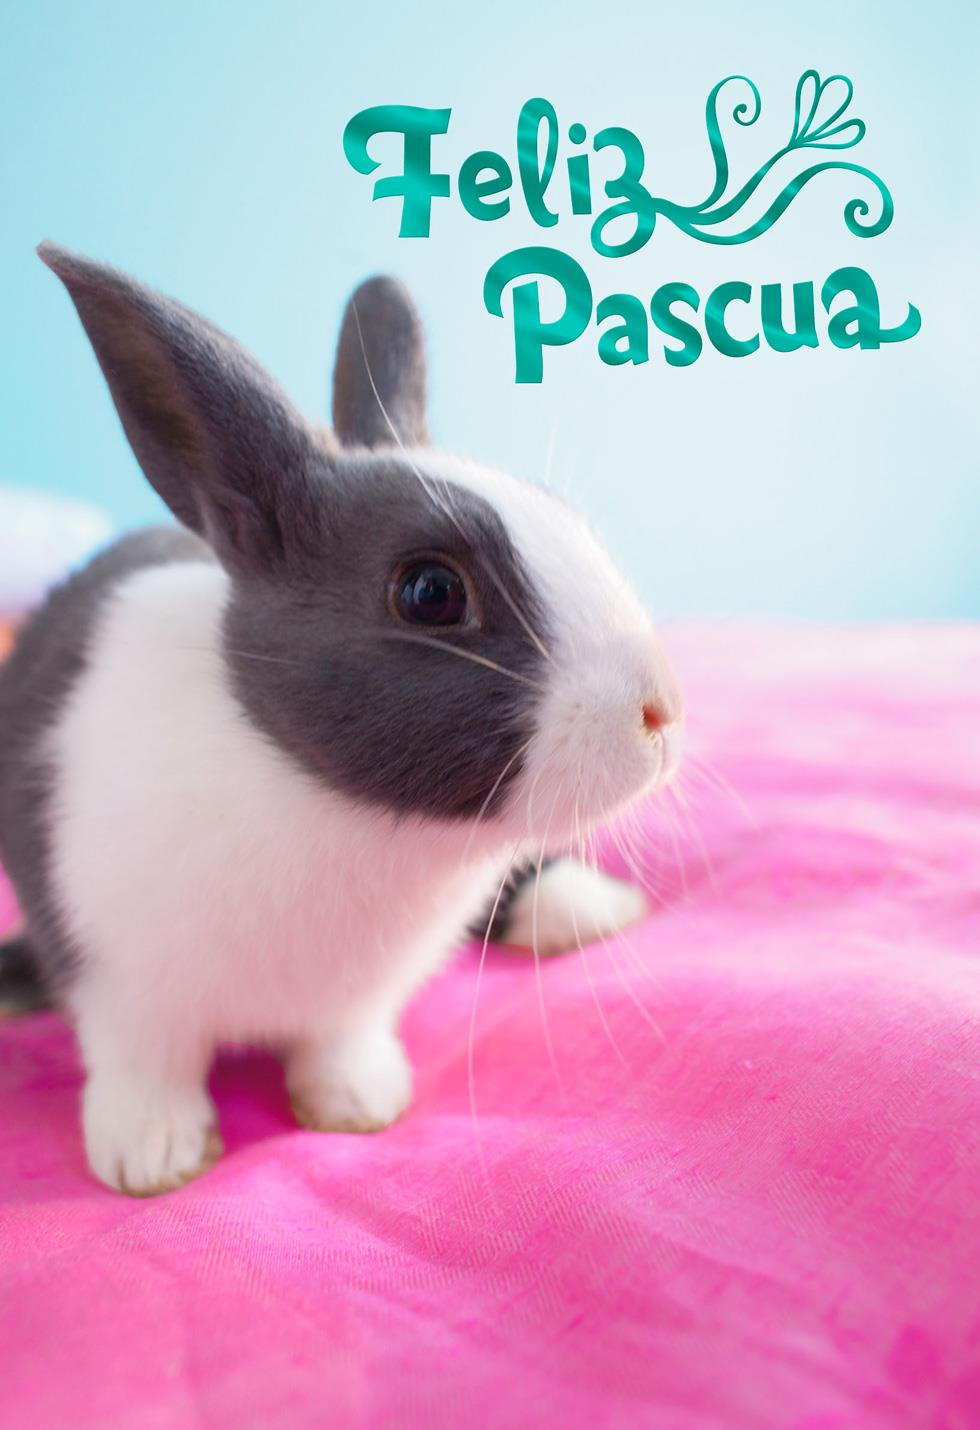 feliz pascua gray bunny spanish easter card